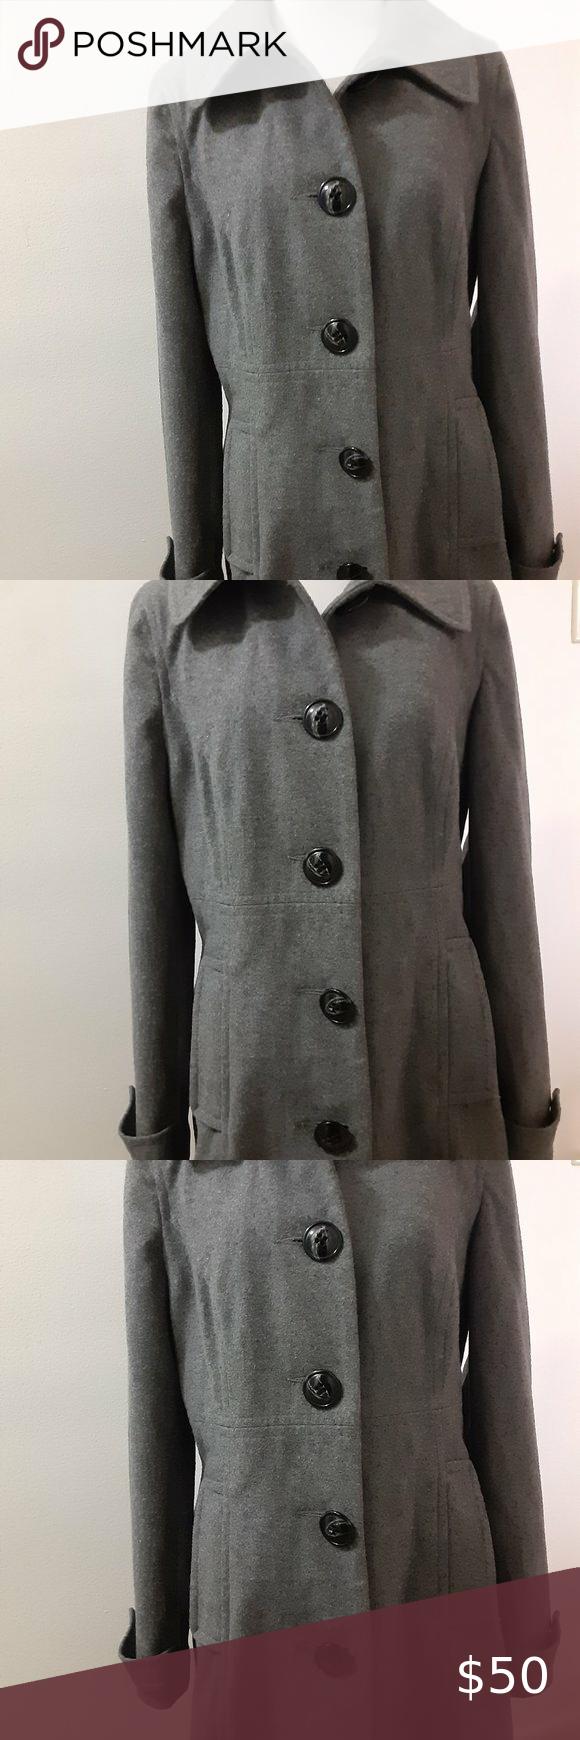 Merona Wool Blend Coat Jacket Rn 17730 Women S M Very Nice Merona Gray Wool Blend Coat Jacket Rn 17730 Women S Size M Th Wool Blend Coat Clothes Design Women [ 1740 x 580 Pixel ]